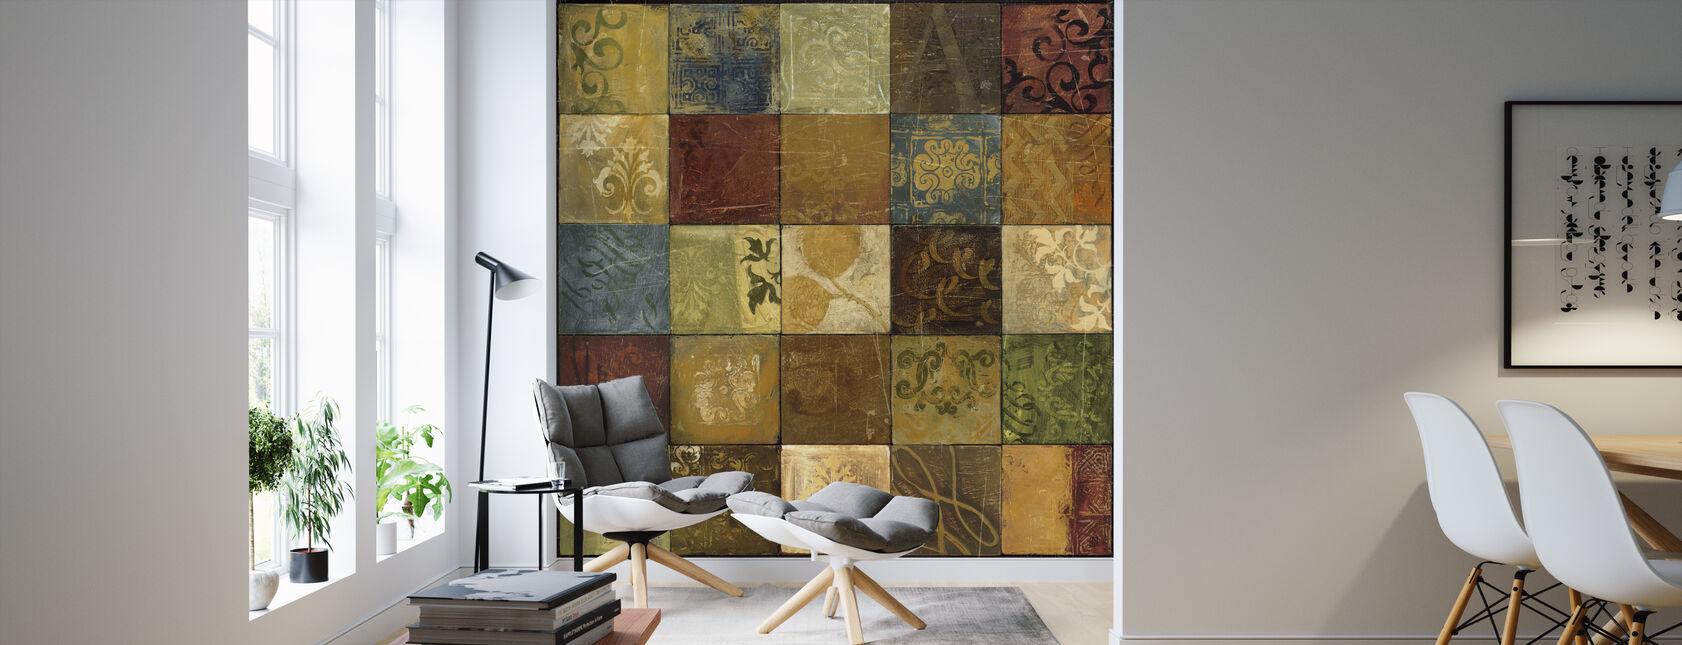 Avery Tillmon - Serendipity - Wag - Wallpaper - Living Room